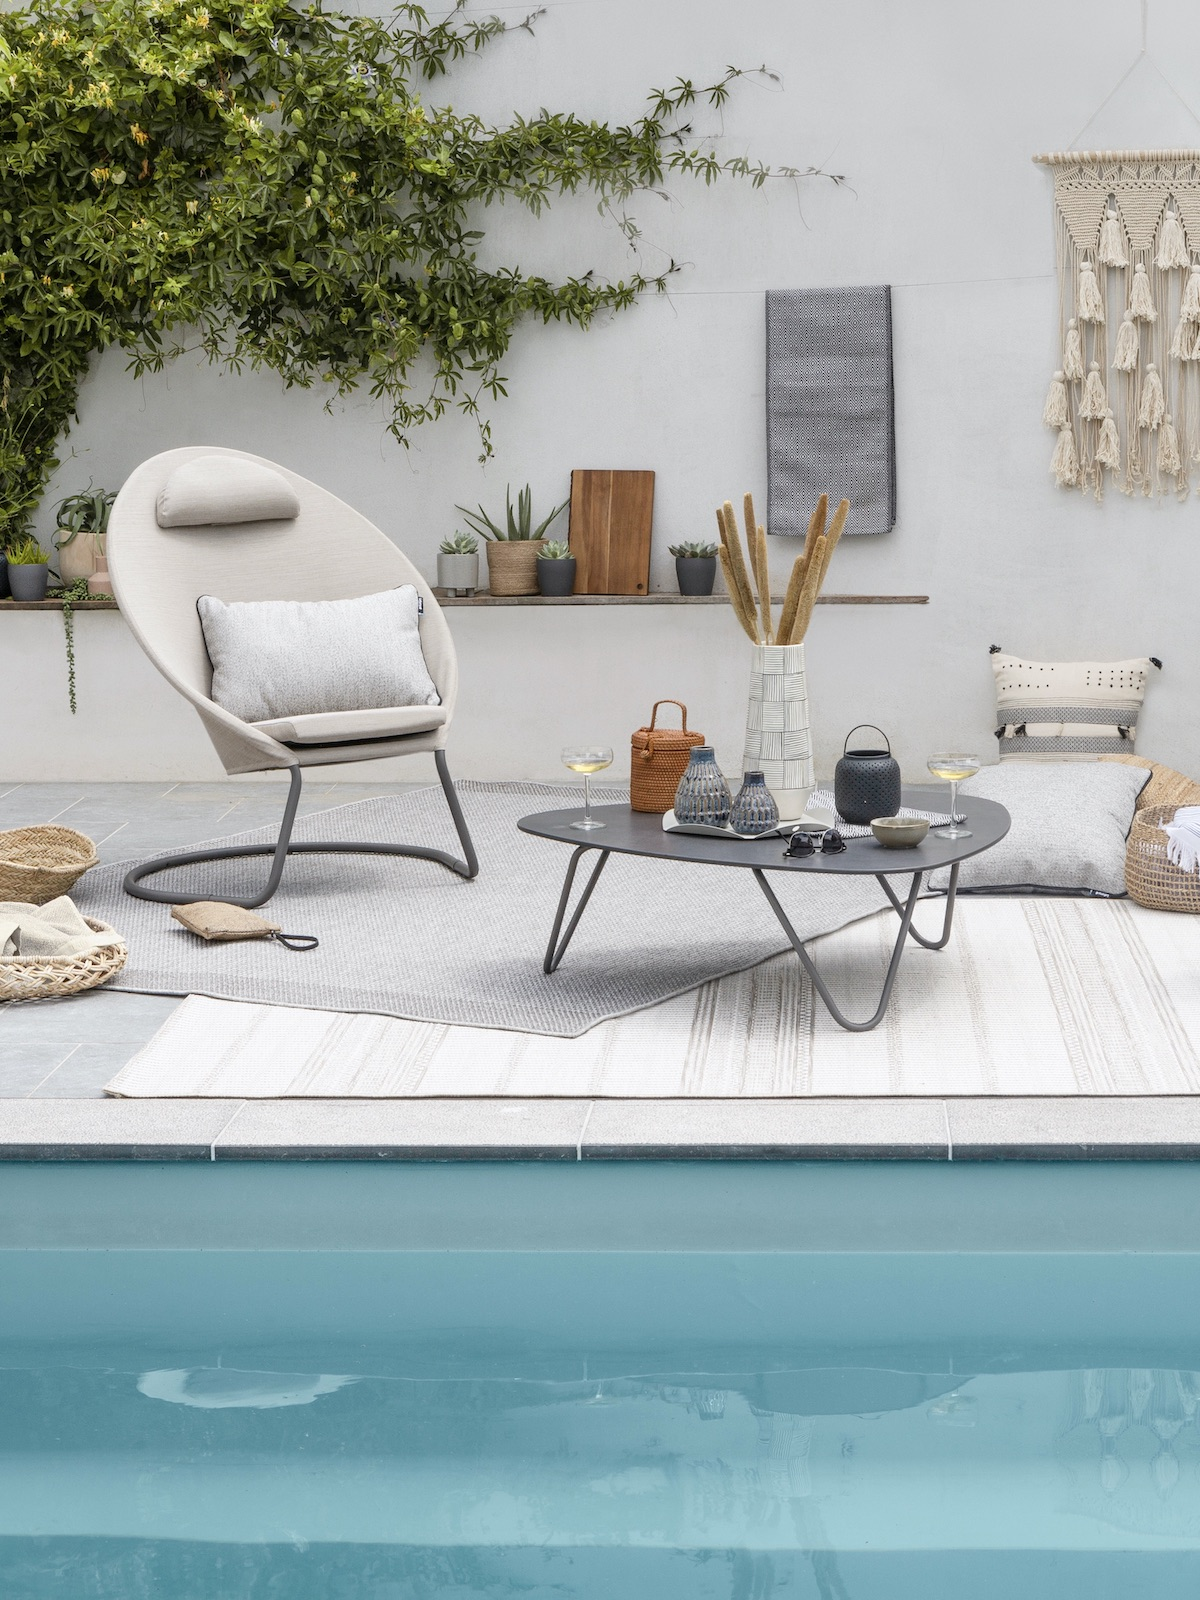 terrasse bord piscine aménagement coin relaxation idée - blog déco - clem around the corner